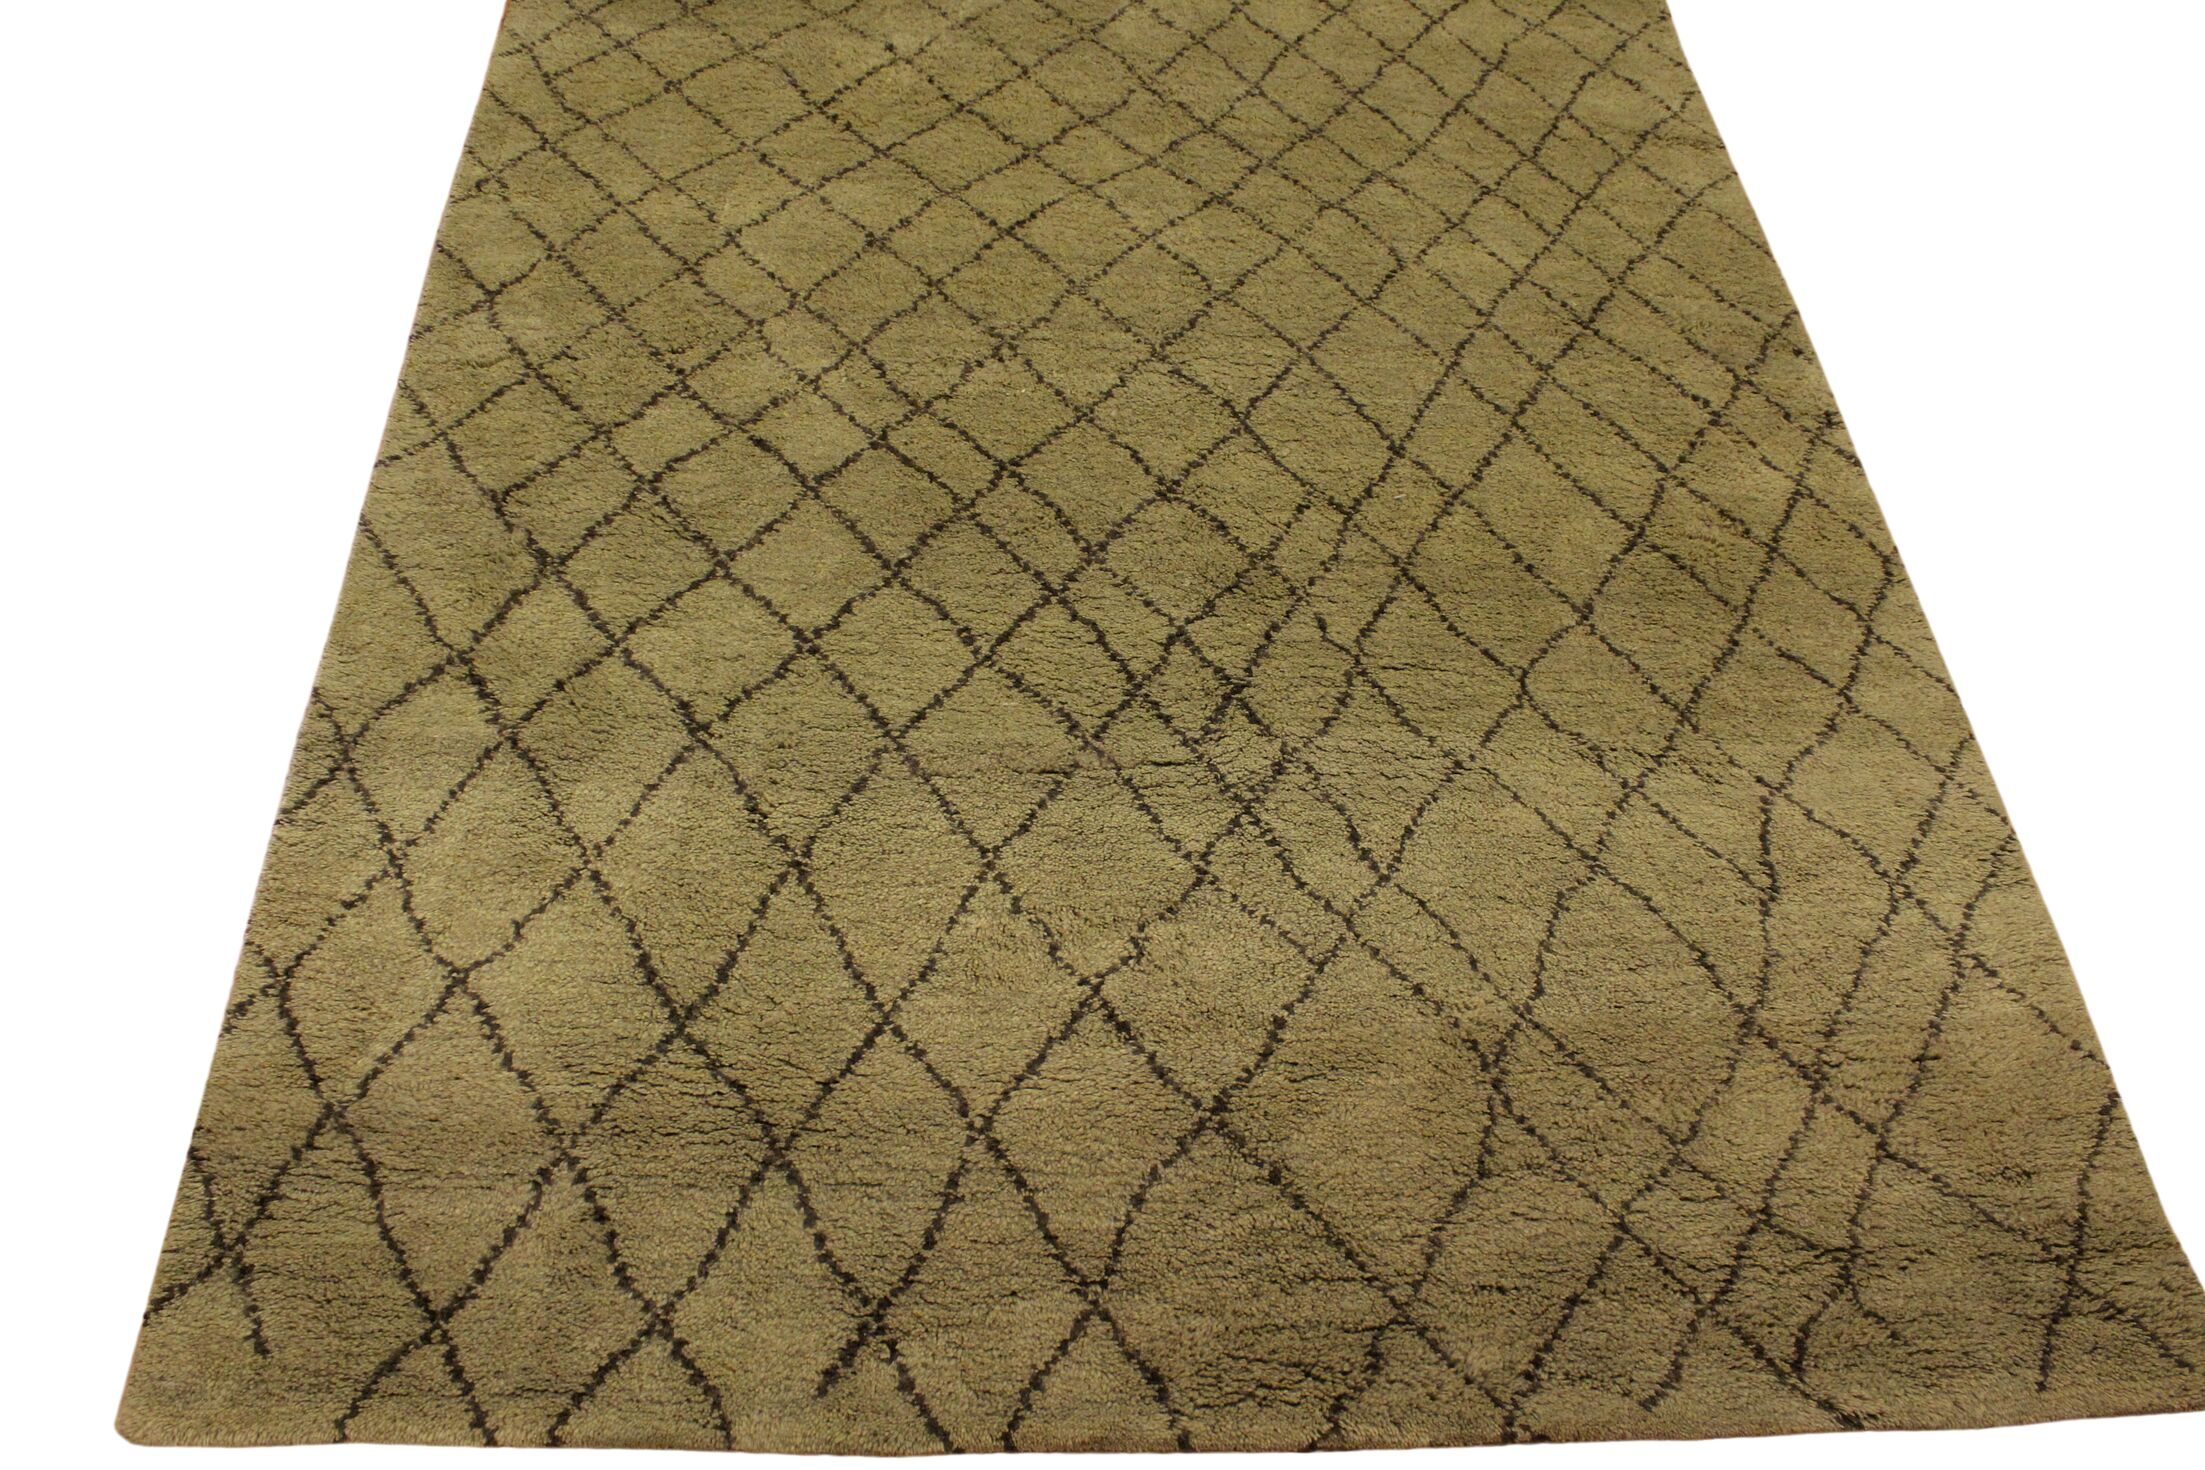 Crosslin Hand Knotted Wool Green/Dark Brown Indoor Area Rug Rug Size: Rectangle 4' x 6'